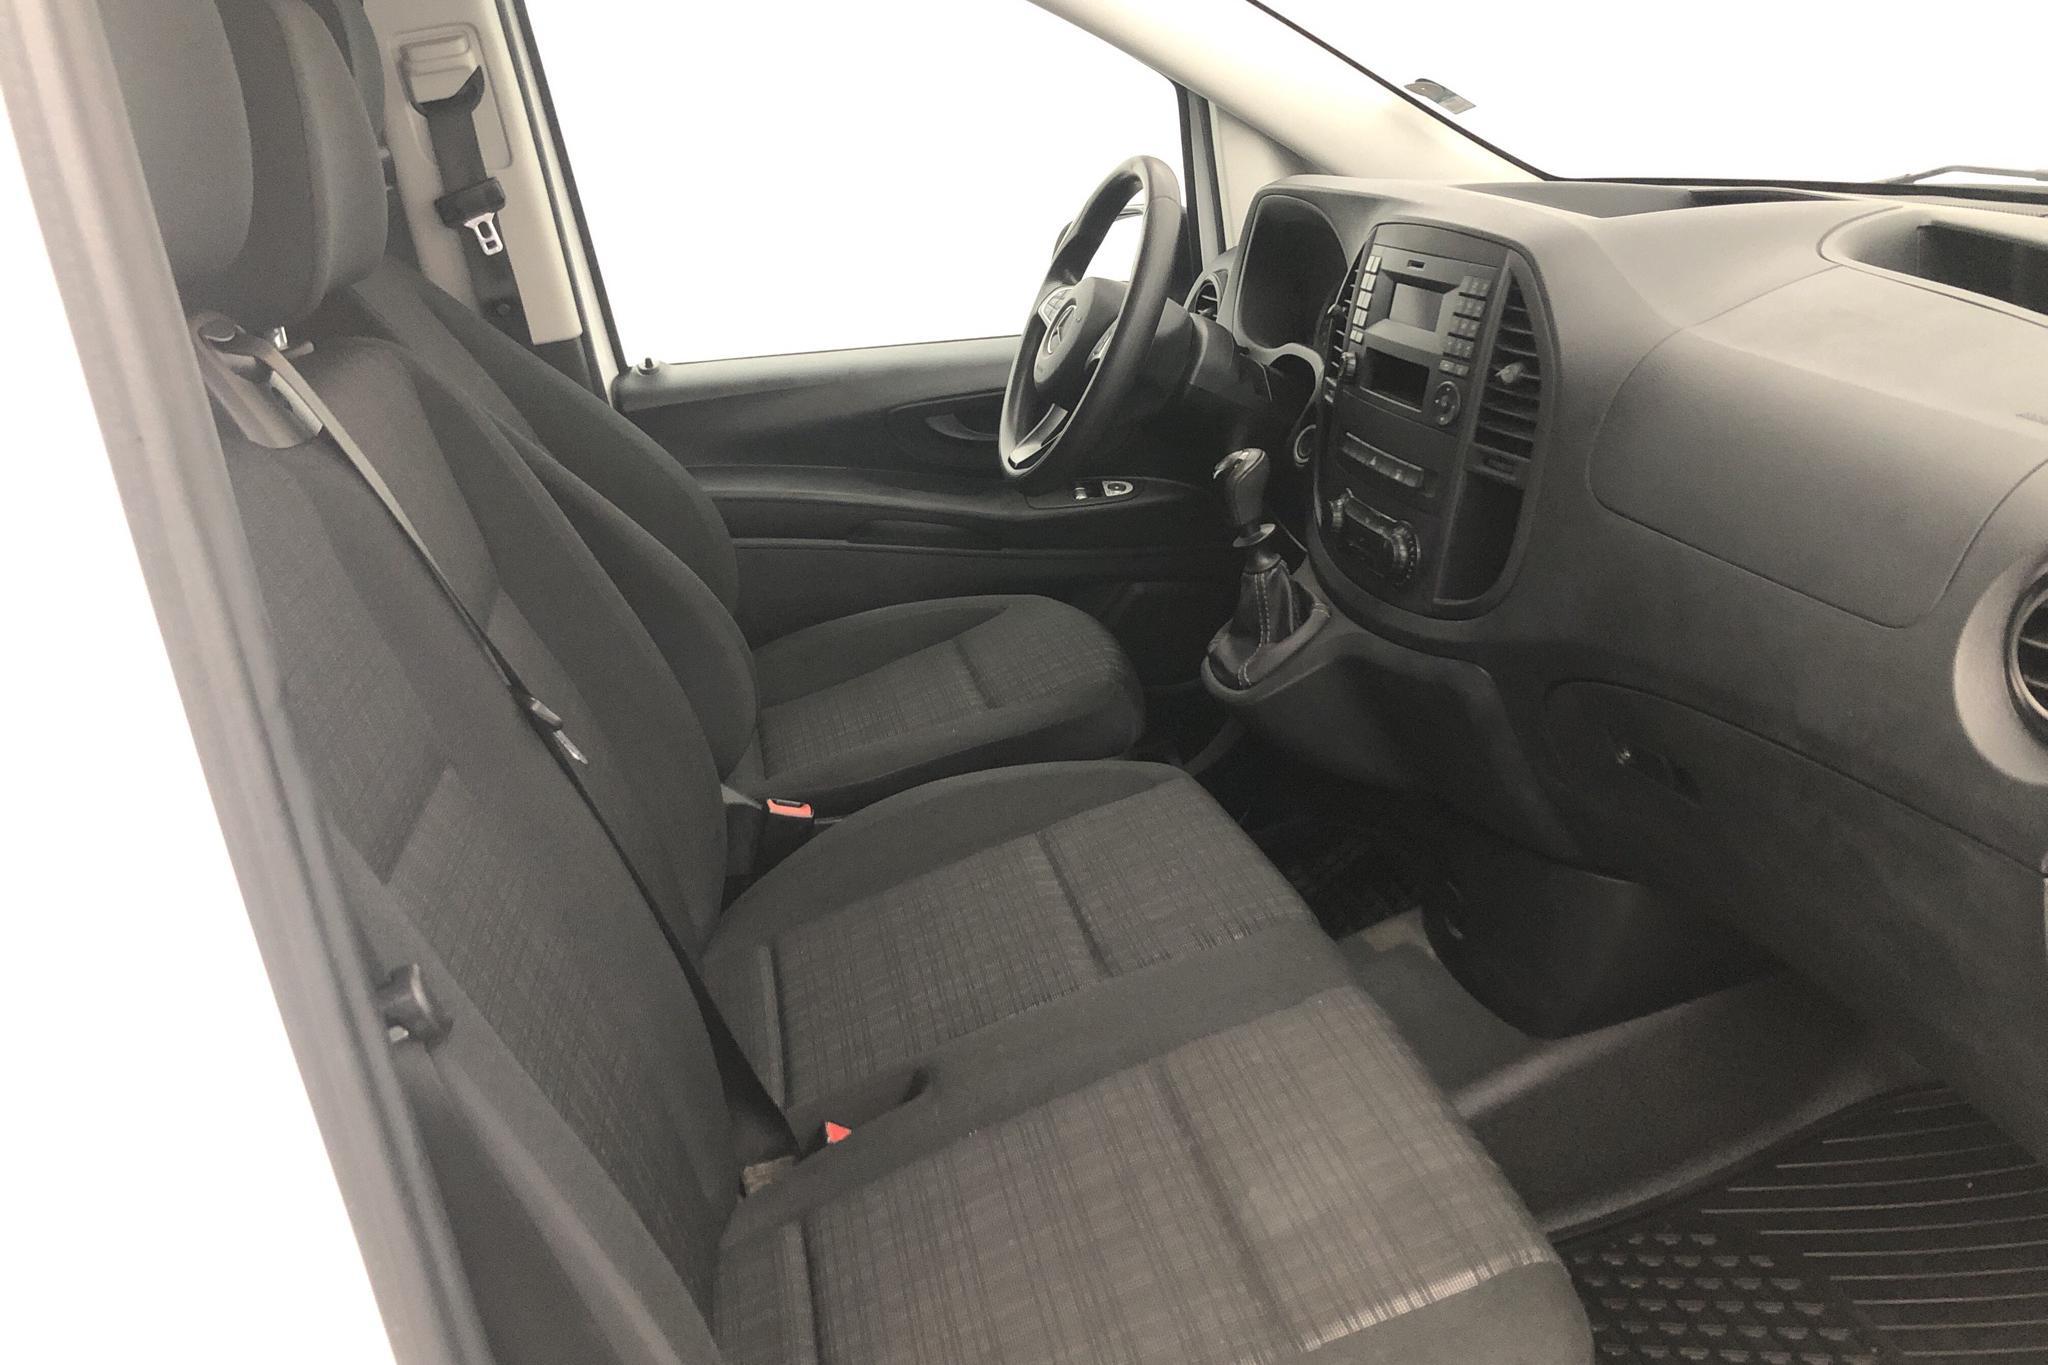 Mercedes Vito 111 CDI W640 (114hk) - 3 944 mil - Manuell - vit - 2019